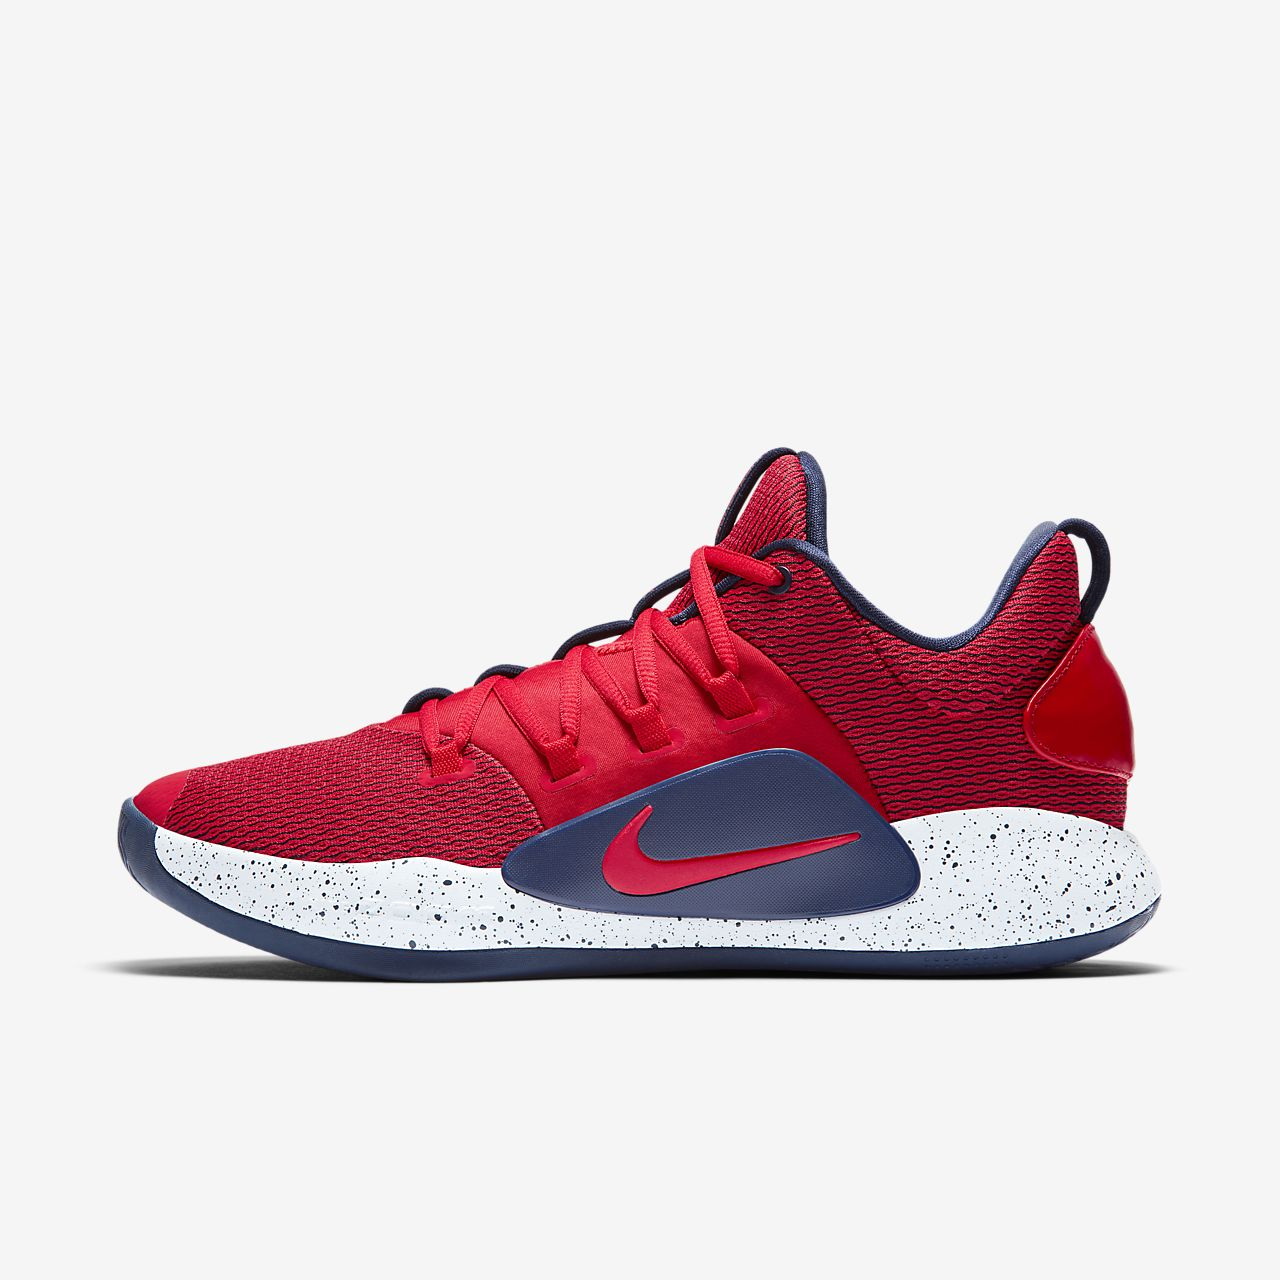 Chaussure de basketball Nike Hyperdunk X Low pour Homme